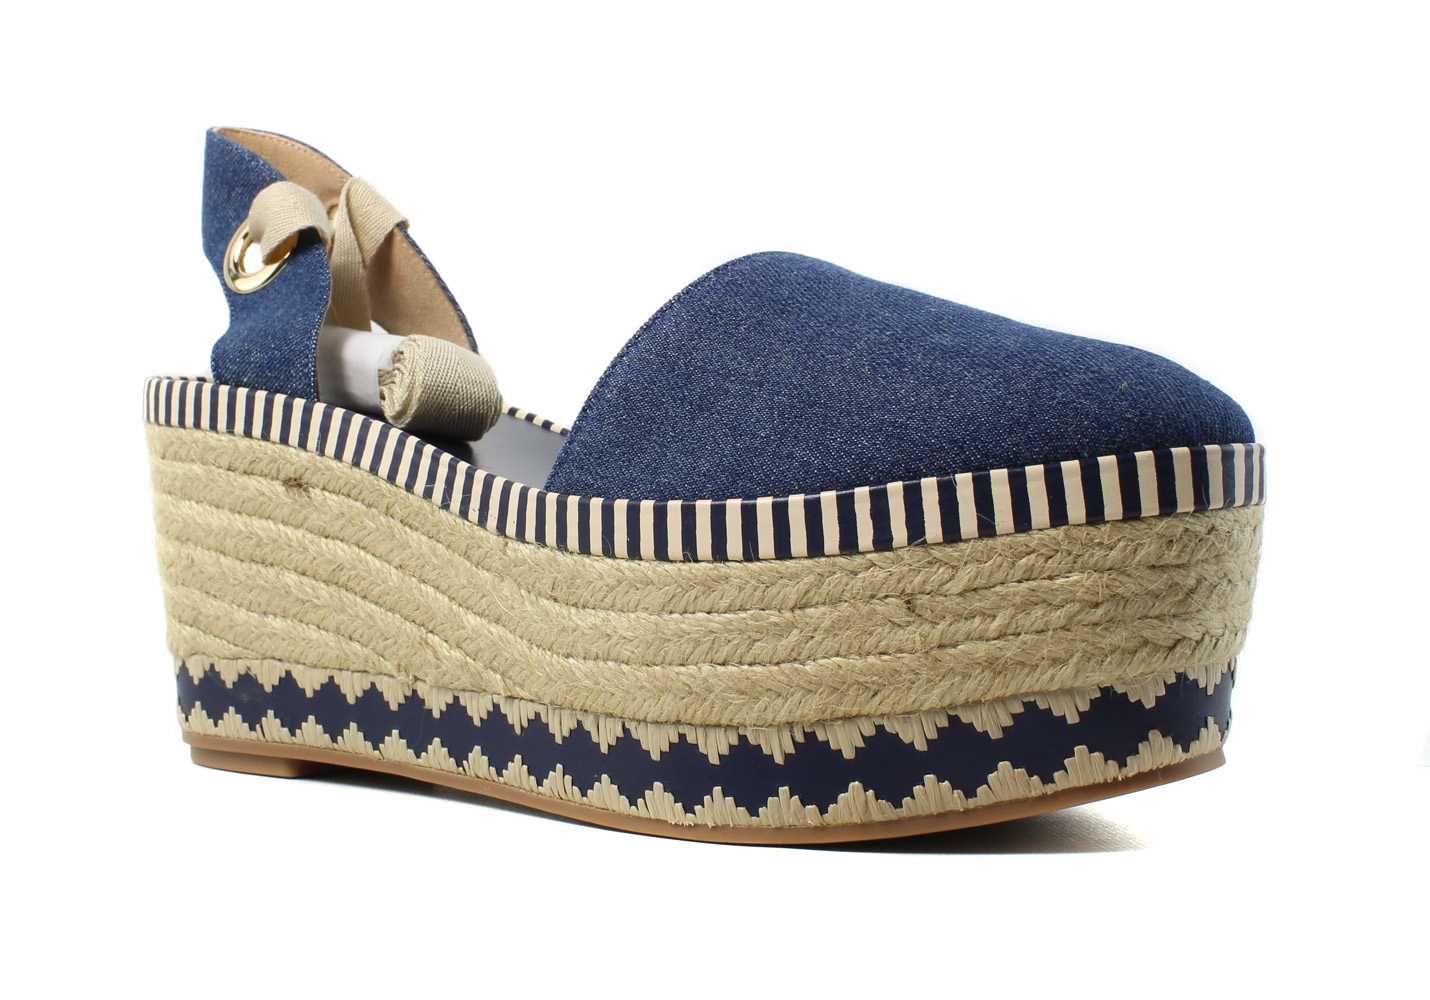 Tory Burch Womens  Blue Espadrille Heels Size 7.5 New